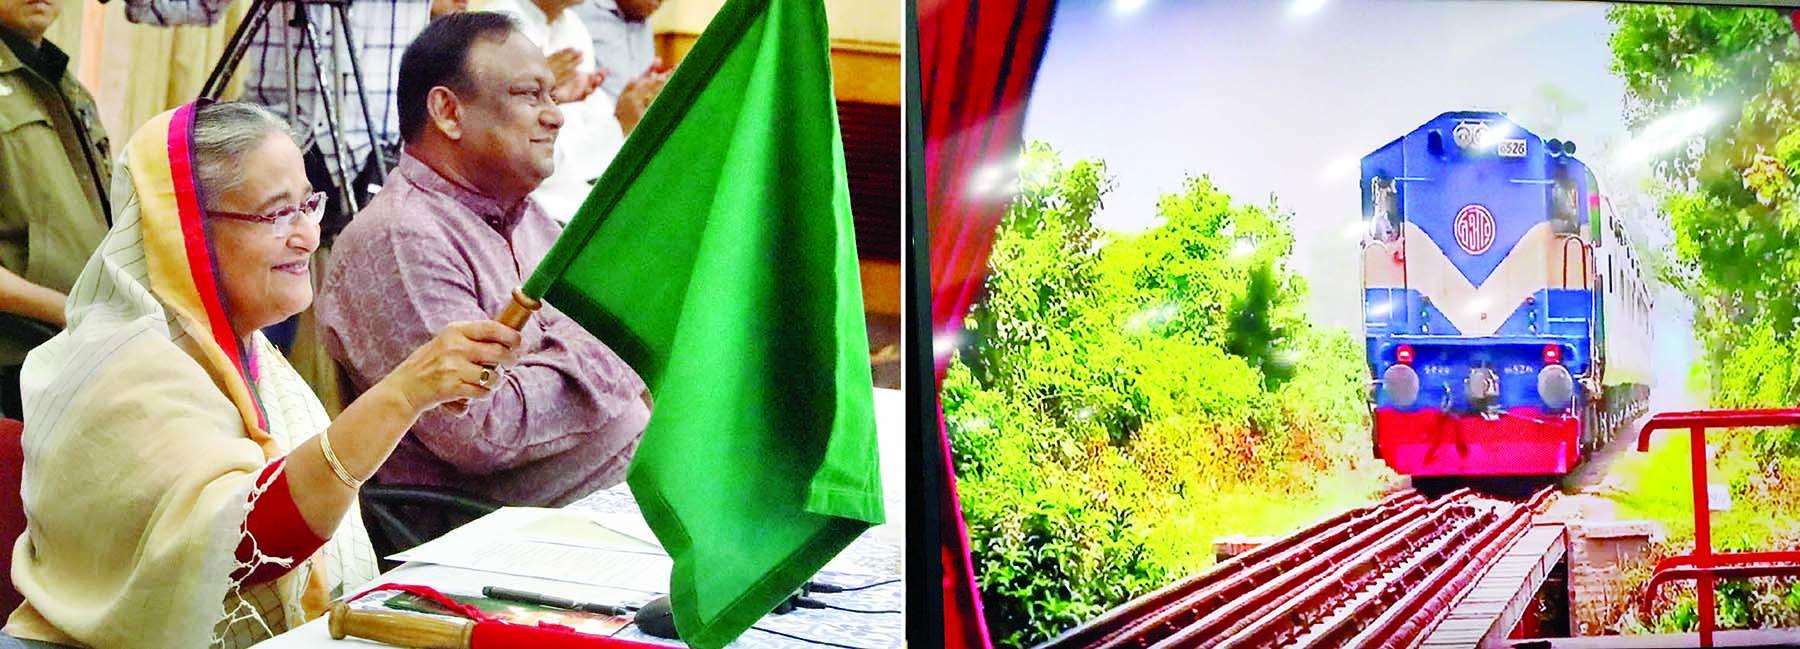 Prime Minister Sheikh Hasina inaugurating new inter-city train 'Kurigram Express' in Kurigram-Dhaka route waving flag through video conference at Ganobhaban on Wednesday.